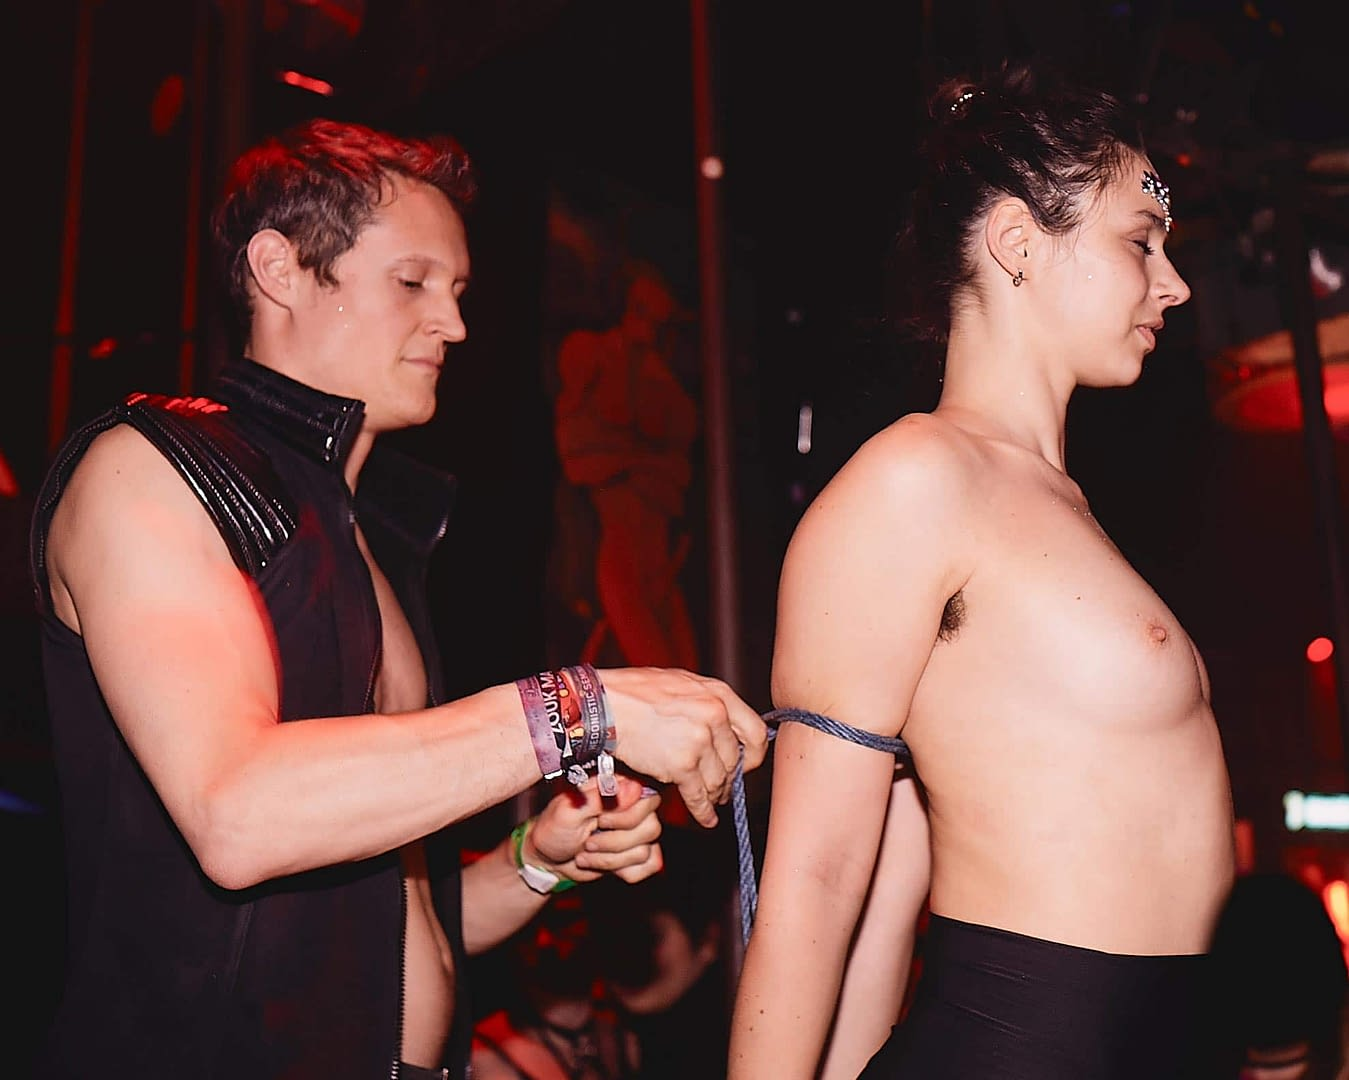 04-Shibari by Sensual Ropes - FourPlay by Jan Ehret im KitKatClub Berlin - Fotograf Martin Peterdamm -210